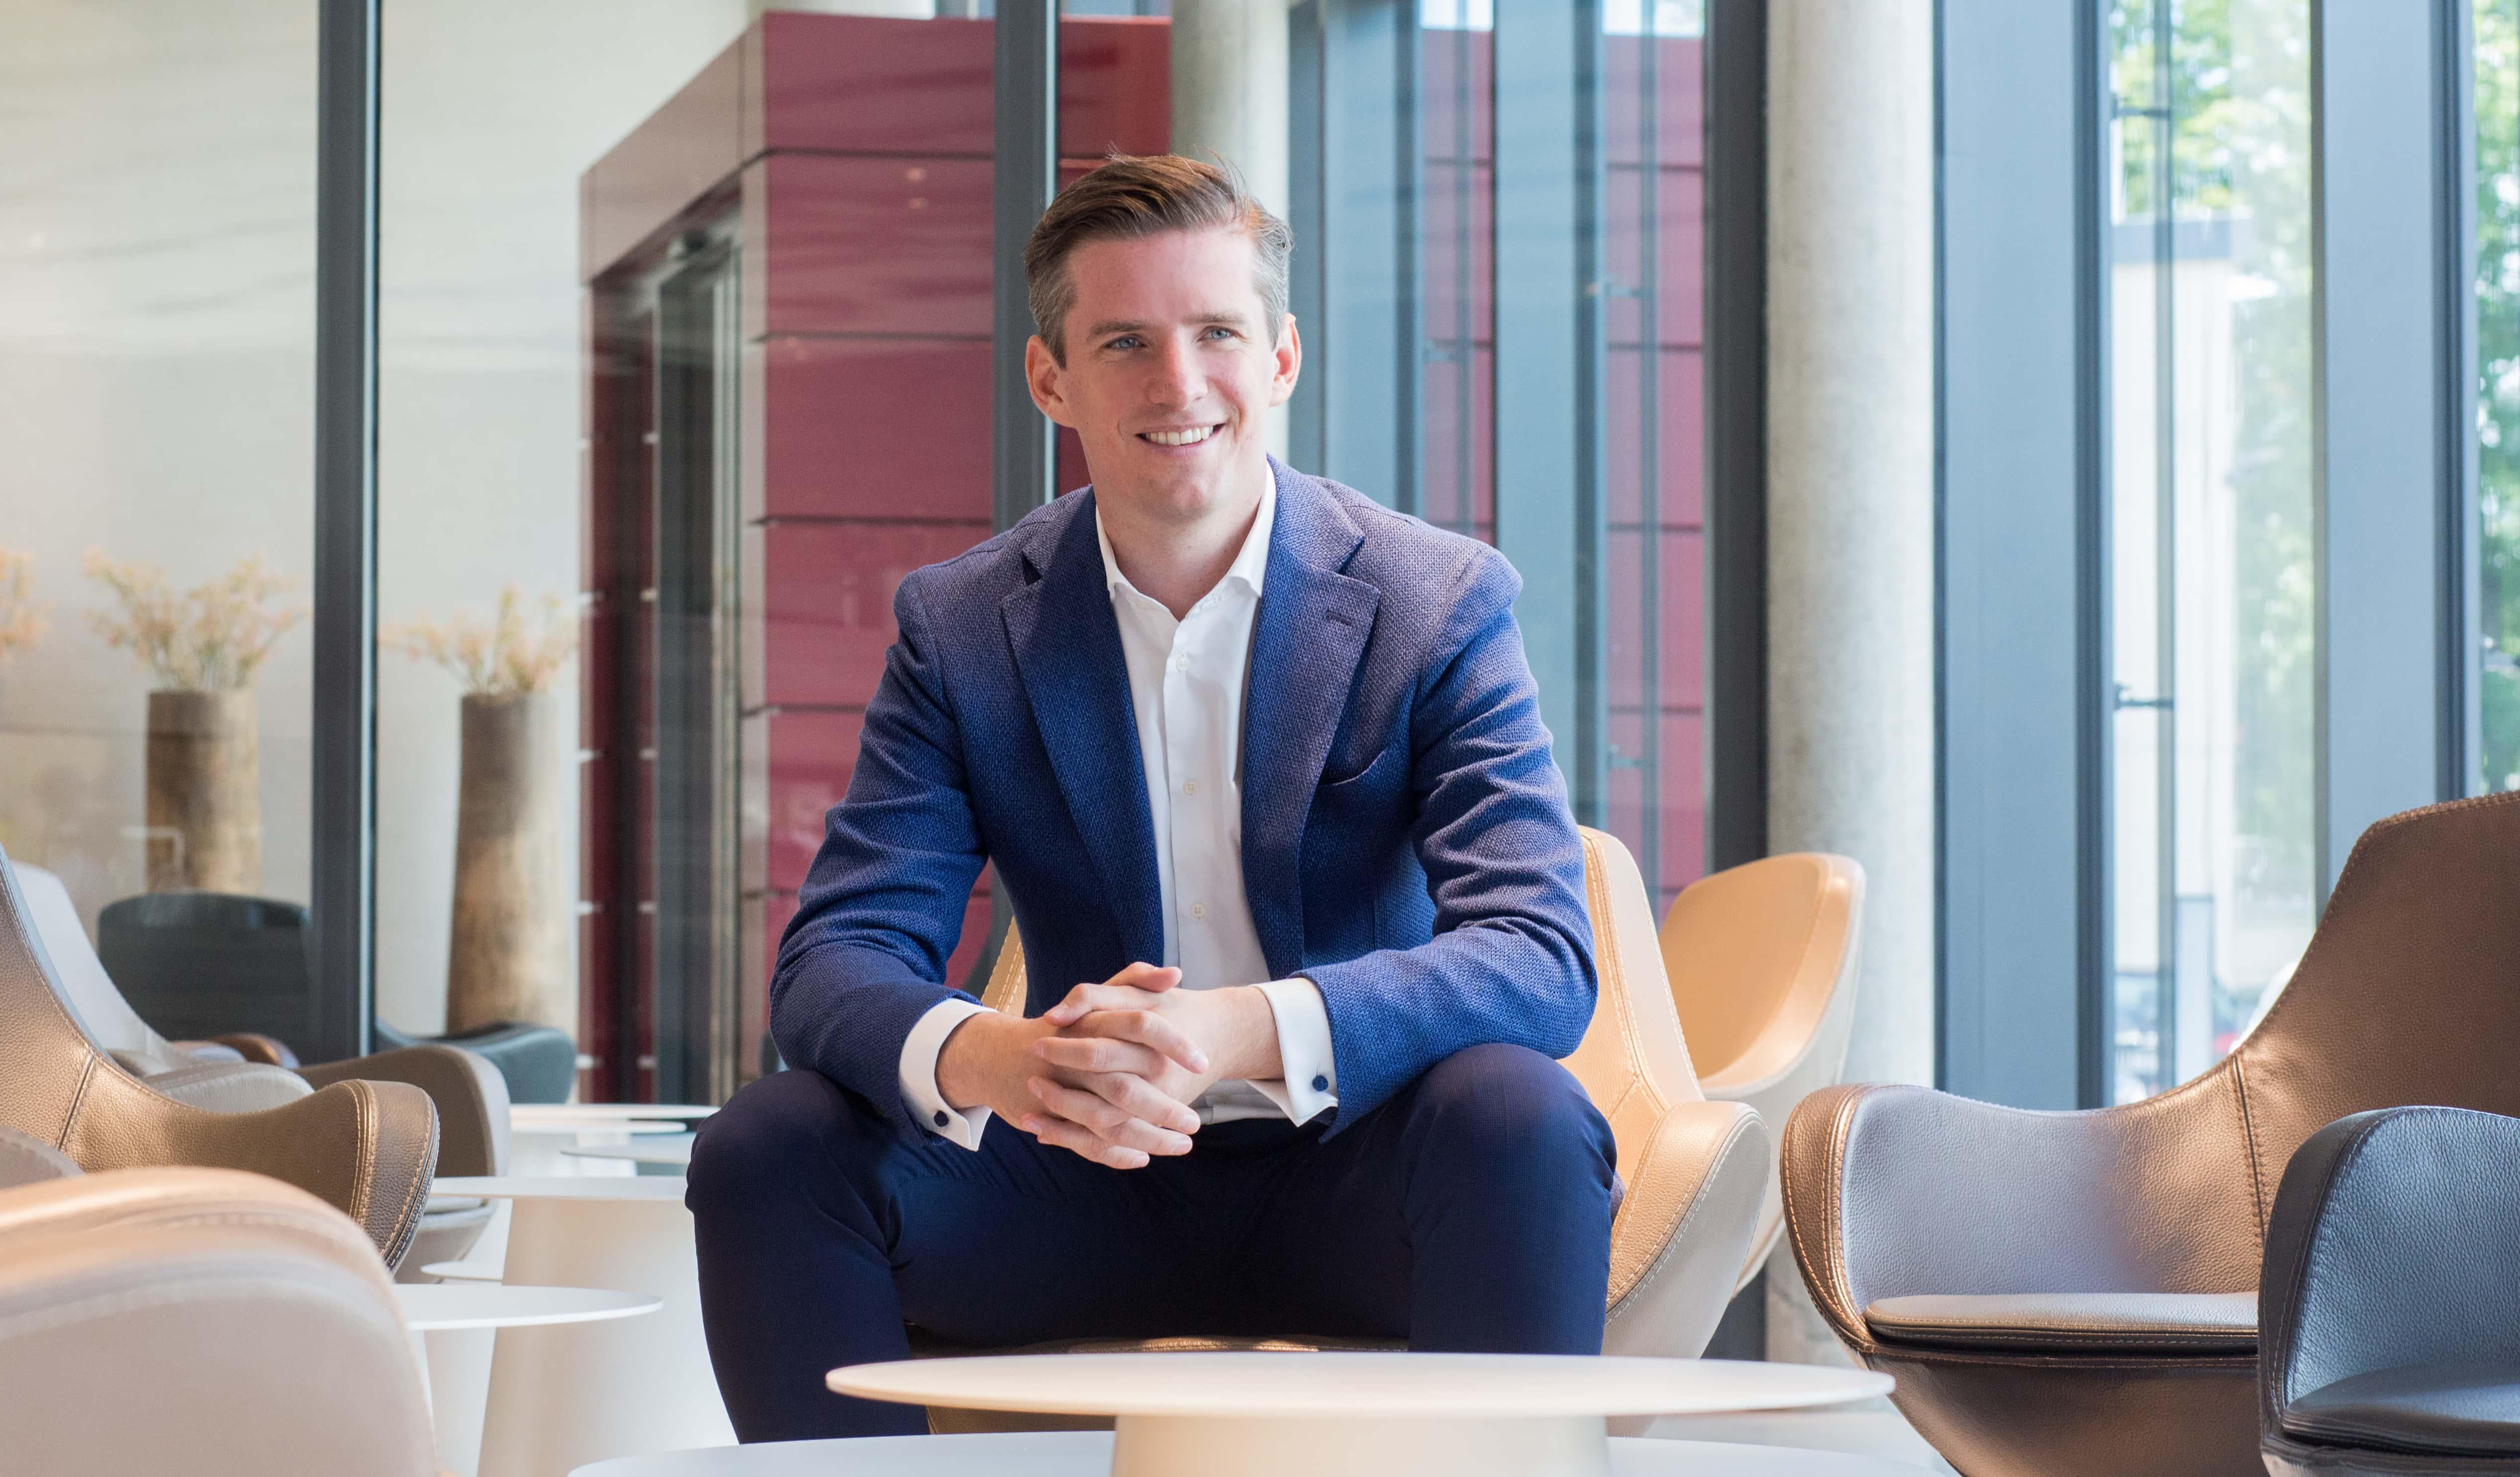 Alexander Strunz, Managing Partner of the LAMILUX Group